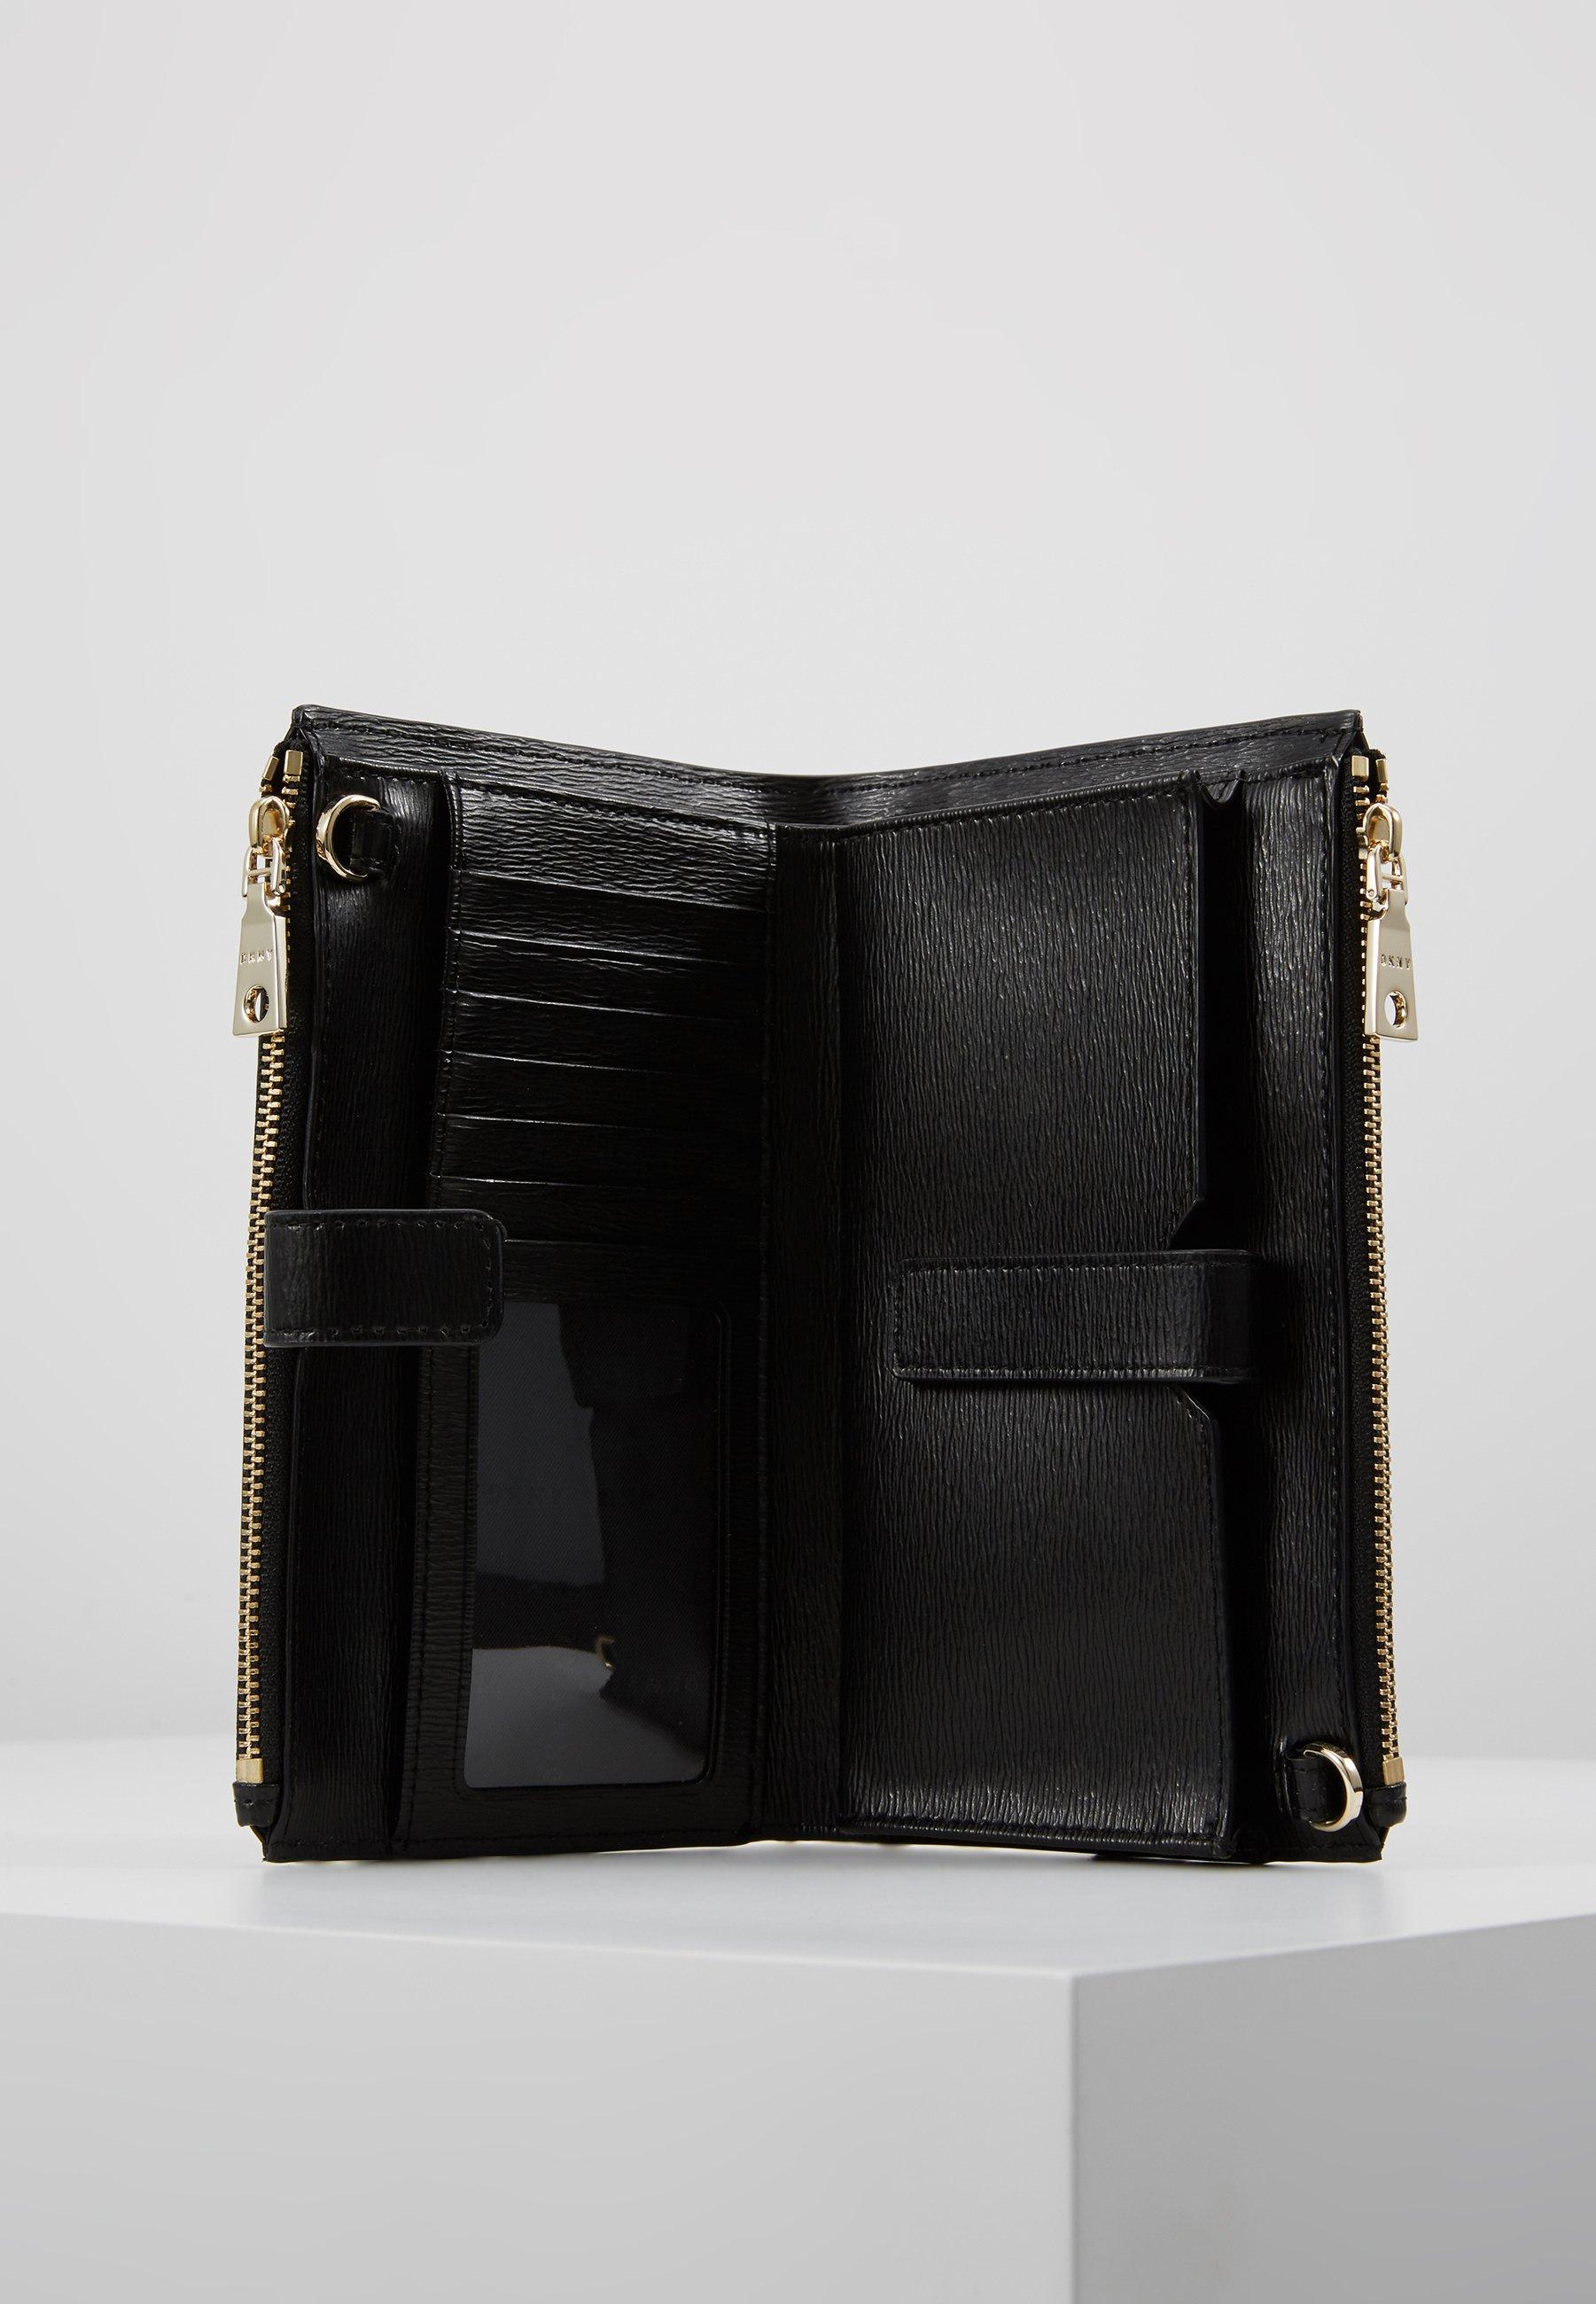 DKNY BRYANT DOUBLE ZIP CBODY WALLET - Skulderveske - black/gold-coloured/svart cyRs7W130T7uNDE